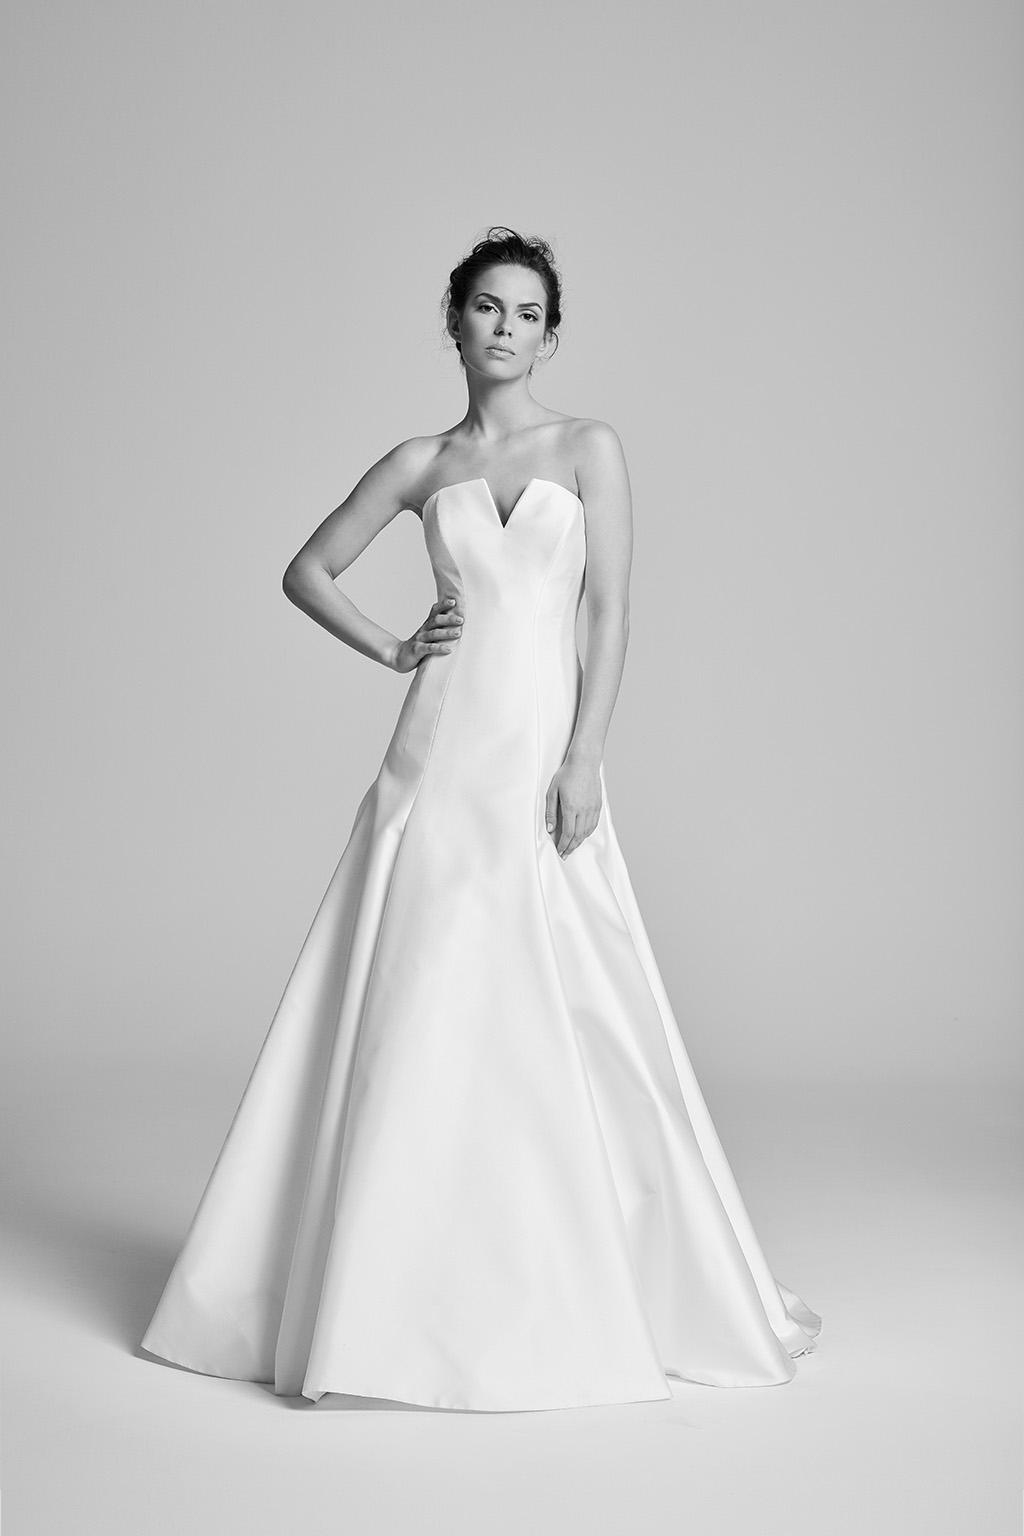 ralston-wedding-dresses-uk-belle-epoque-collection-2018.jpg